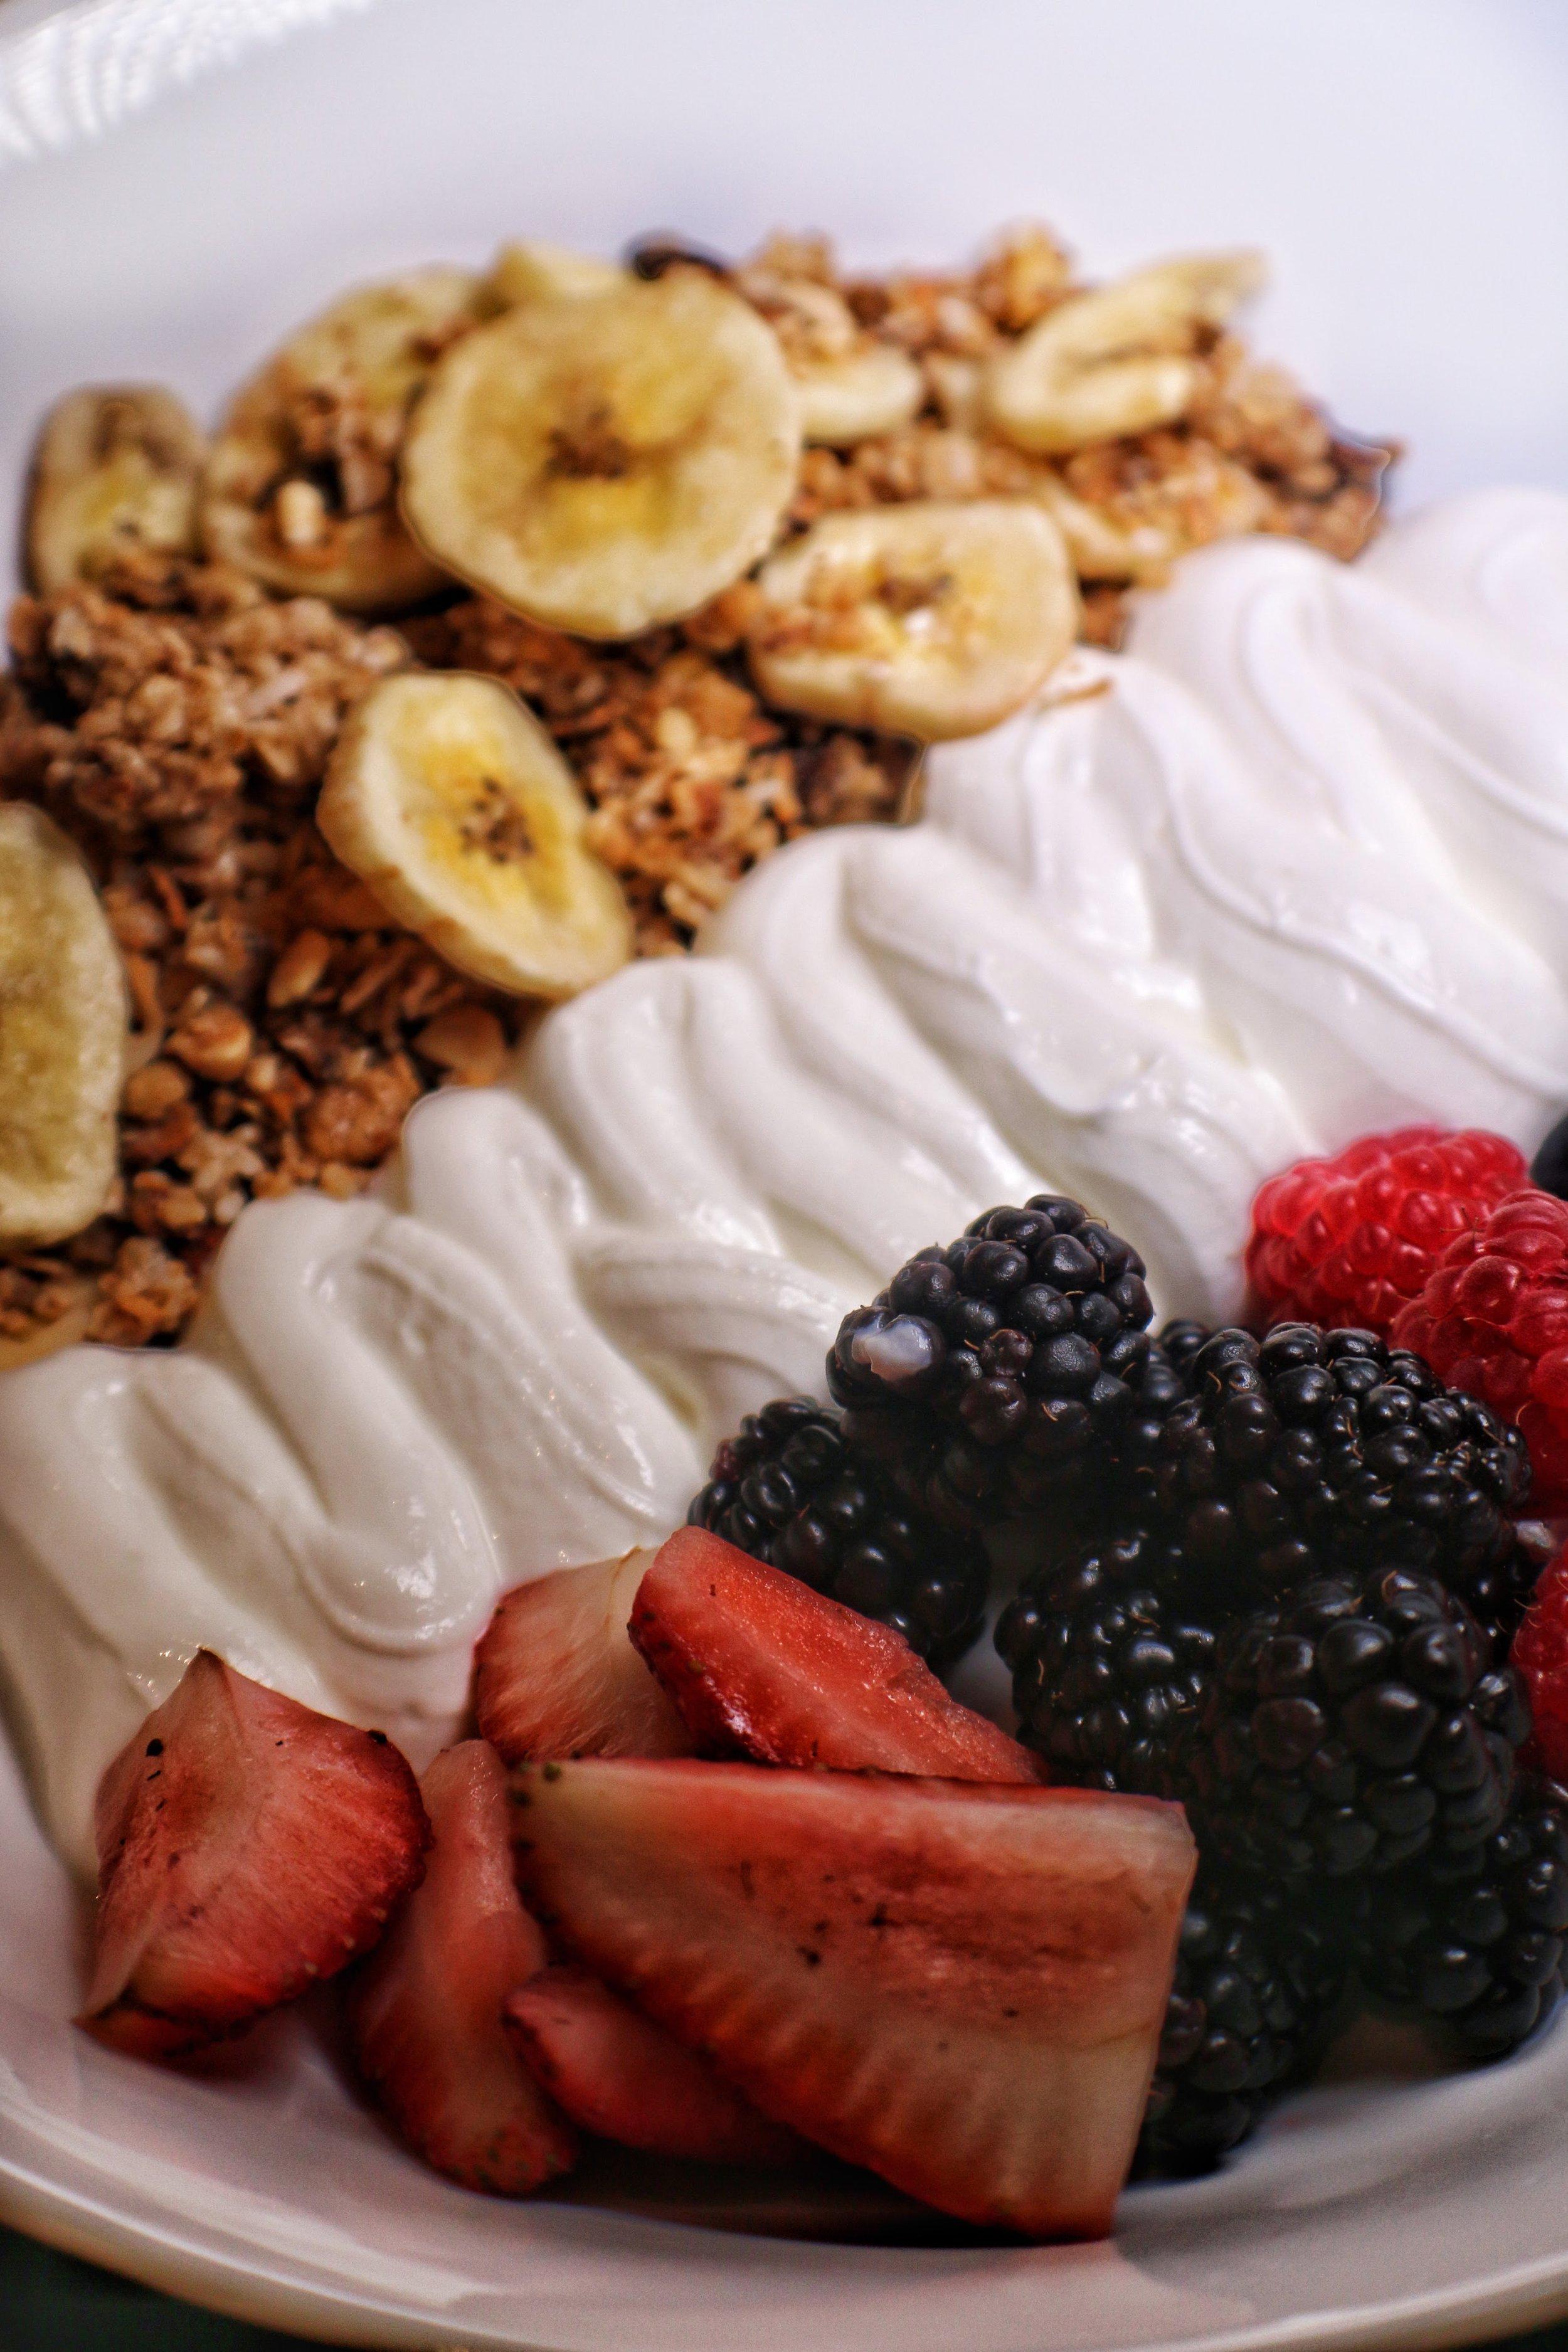 Homemade granola, winter fruits, Greek style yogurt